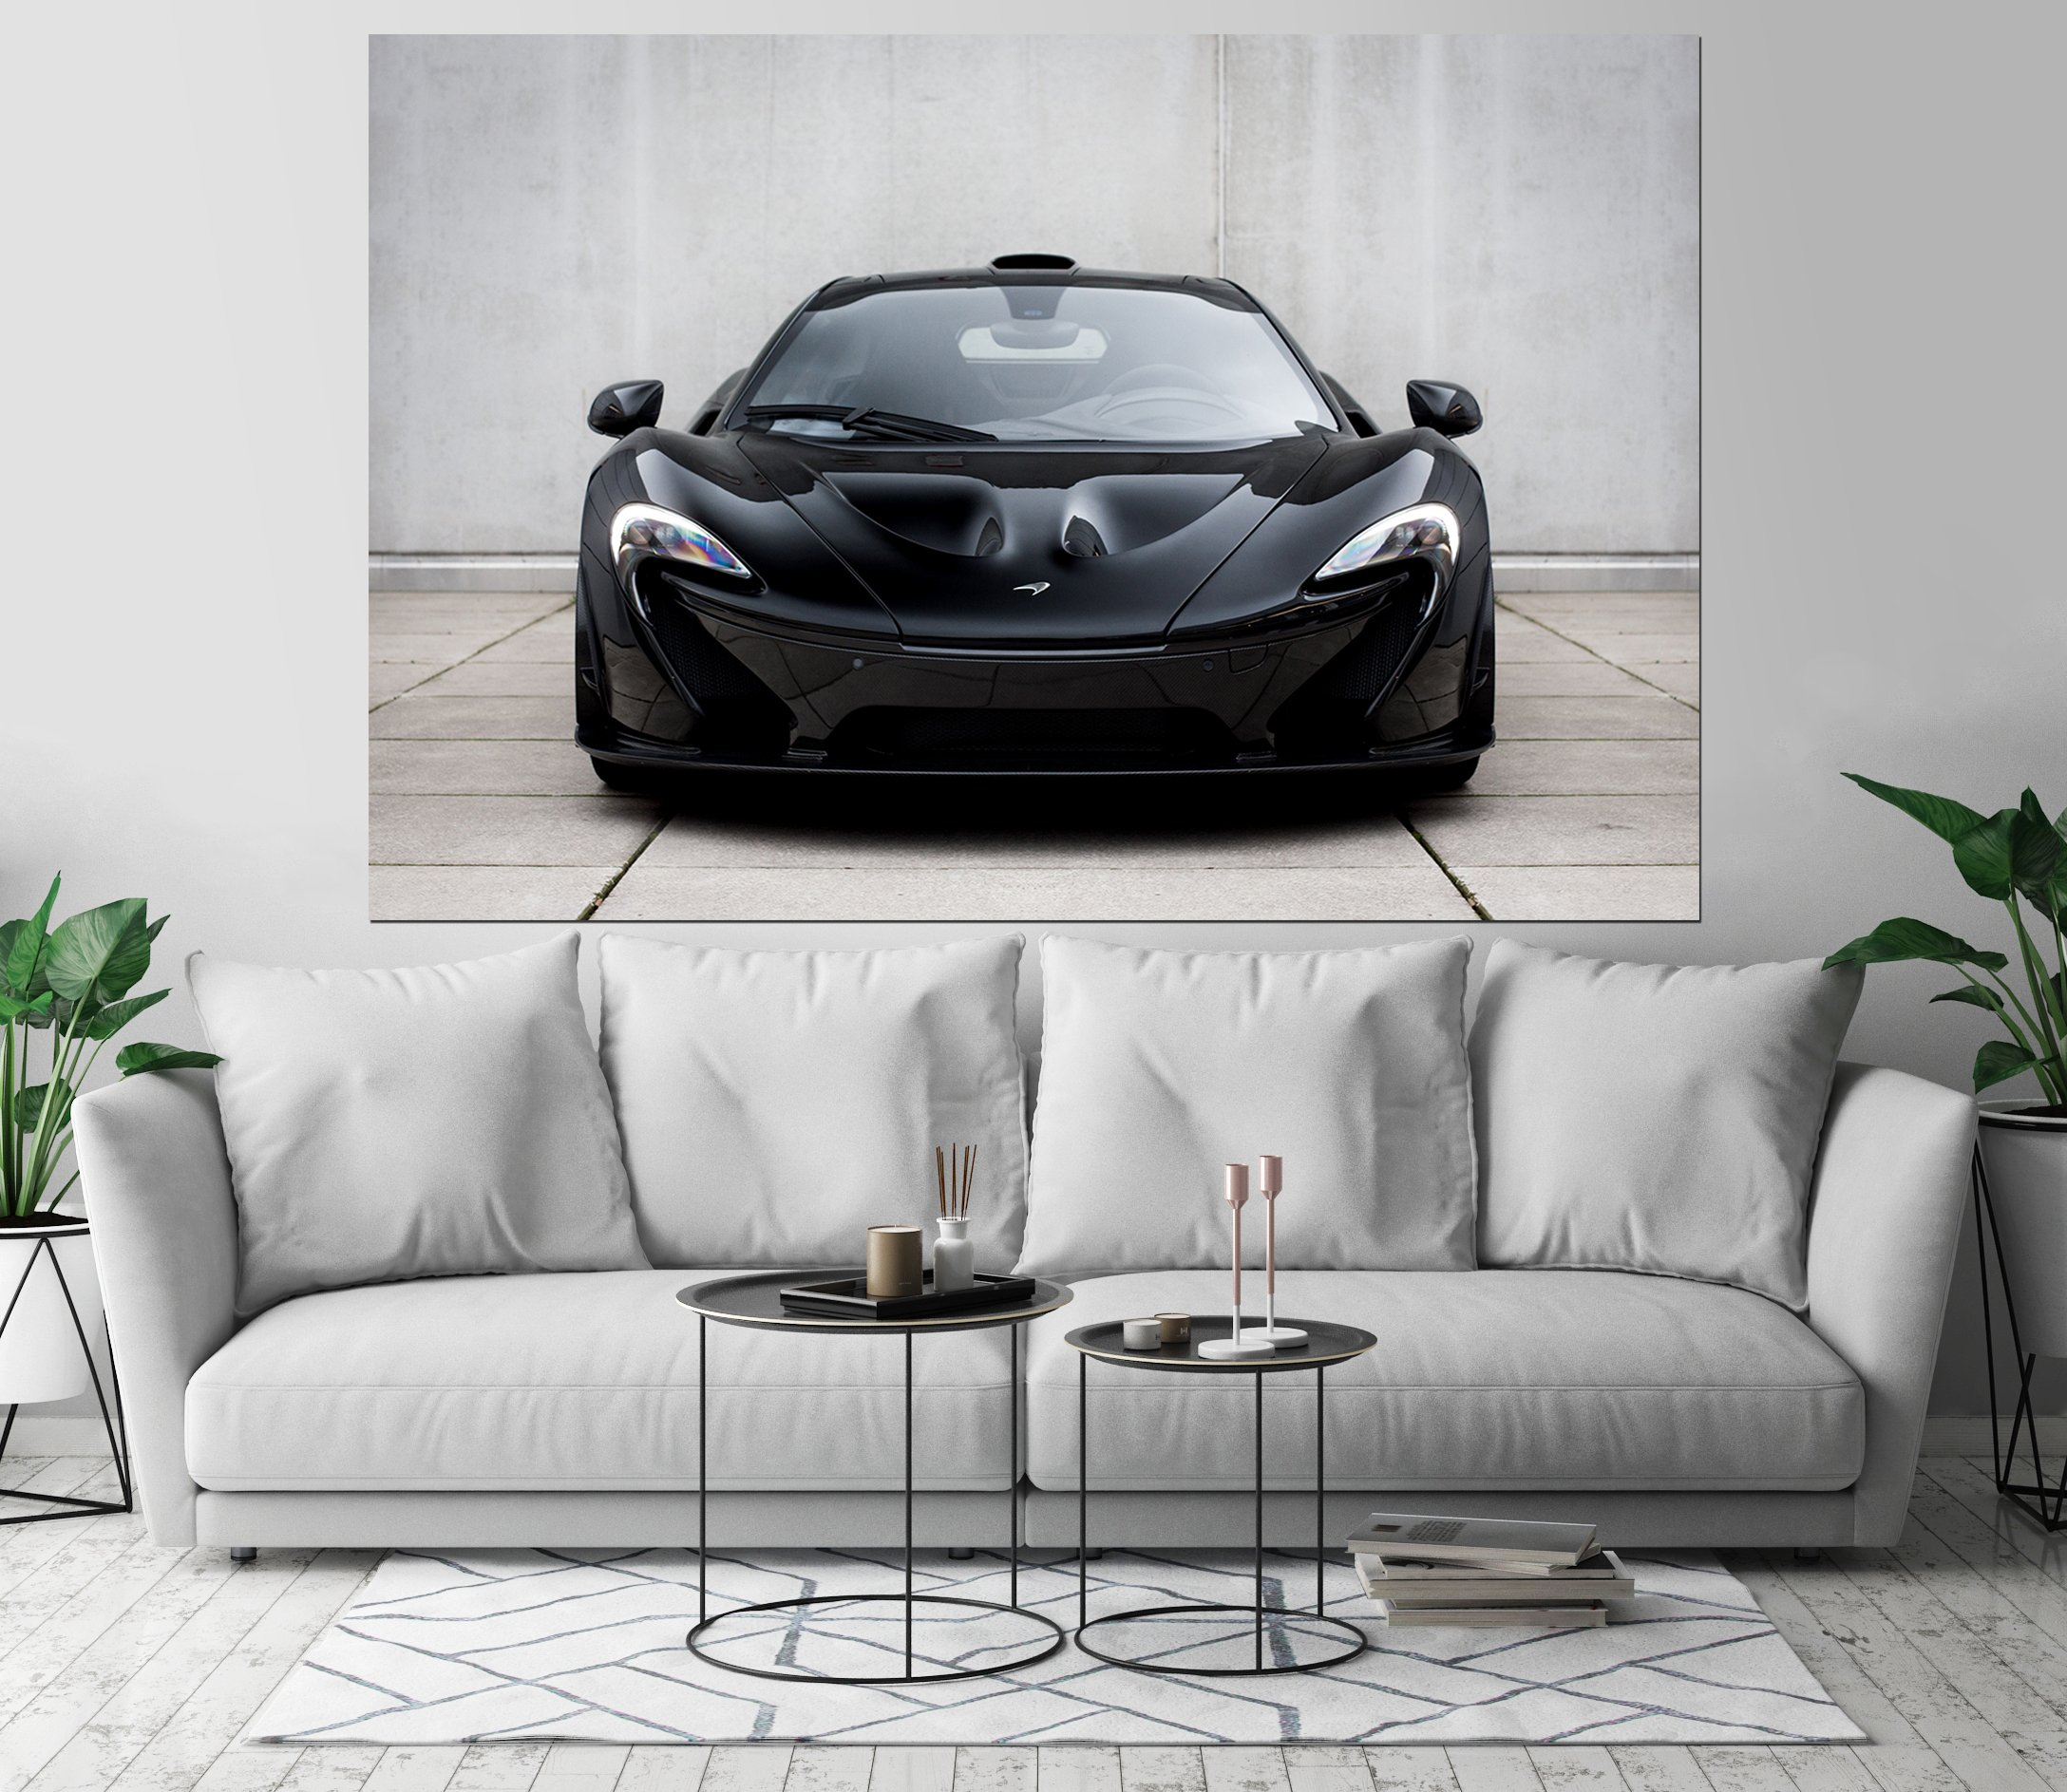 McLaren P1 Luxury Automobile Car Art Print Wall Decor Image Self-Adhesive - Wallpaper Sticker 48 x 72-3XL